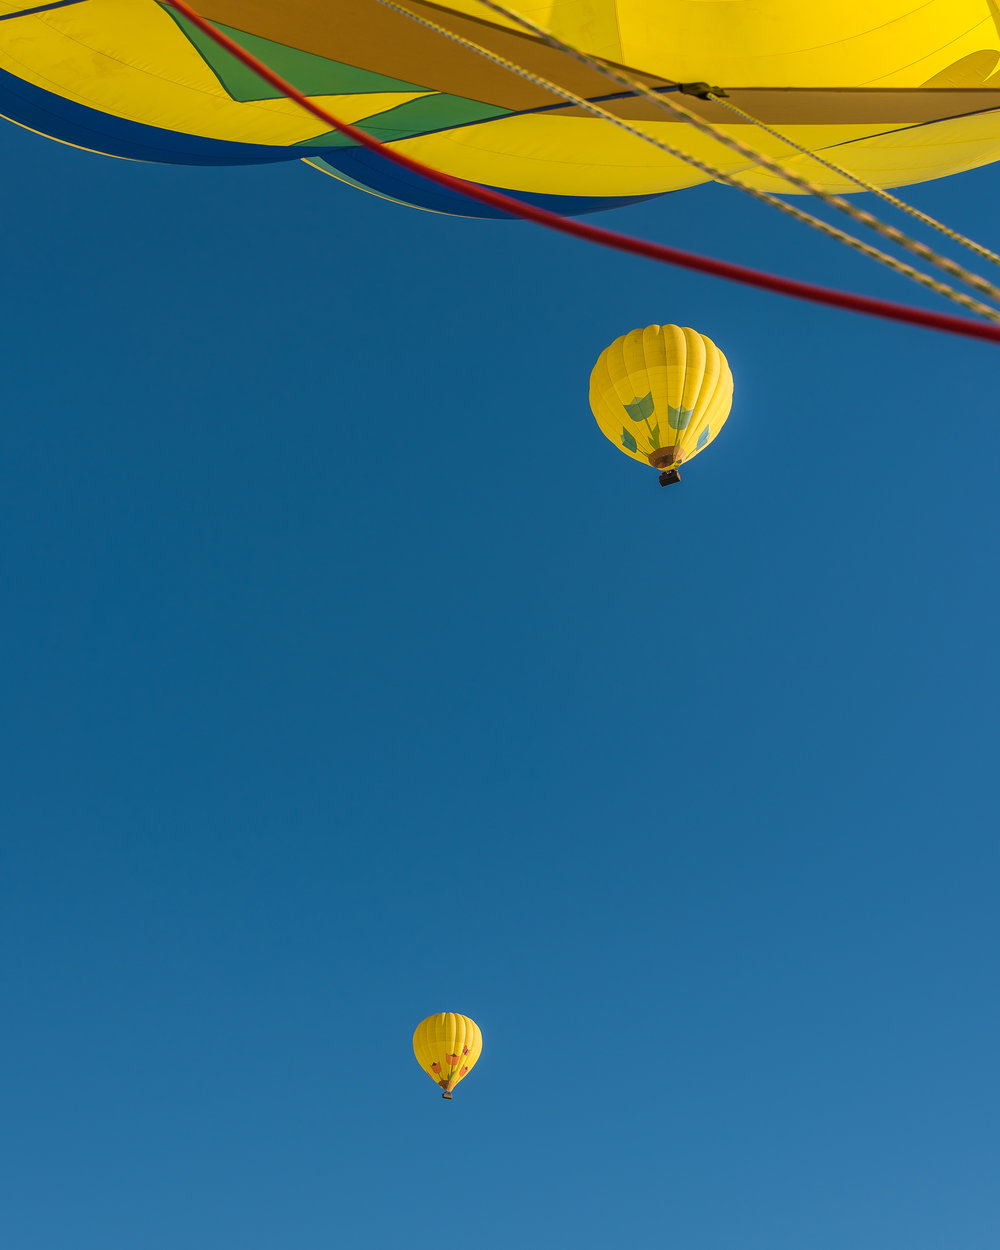 NAPA-Baloon-75.jpg